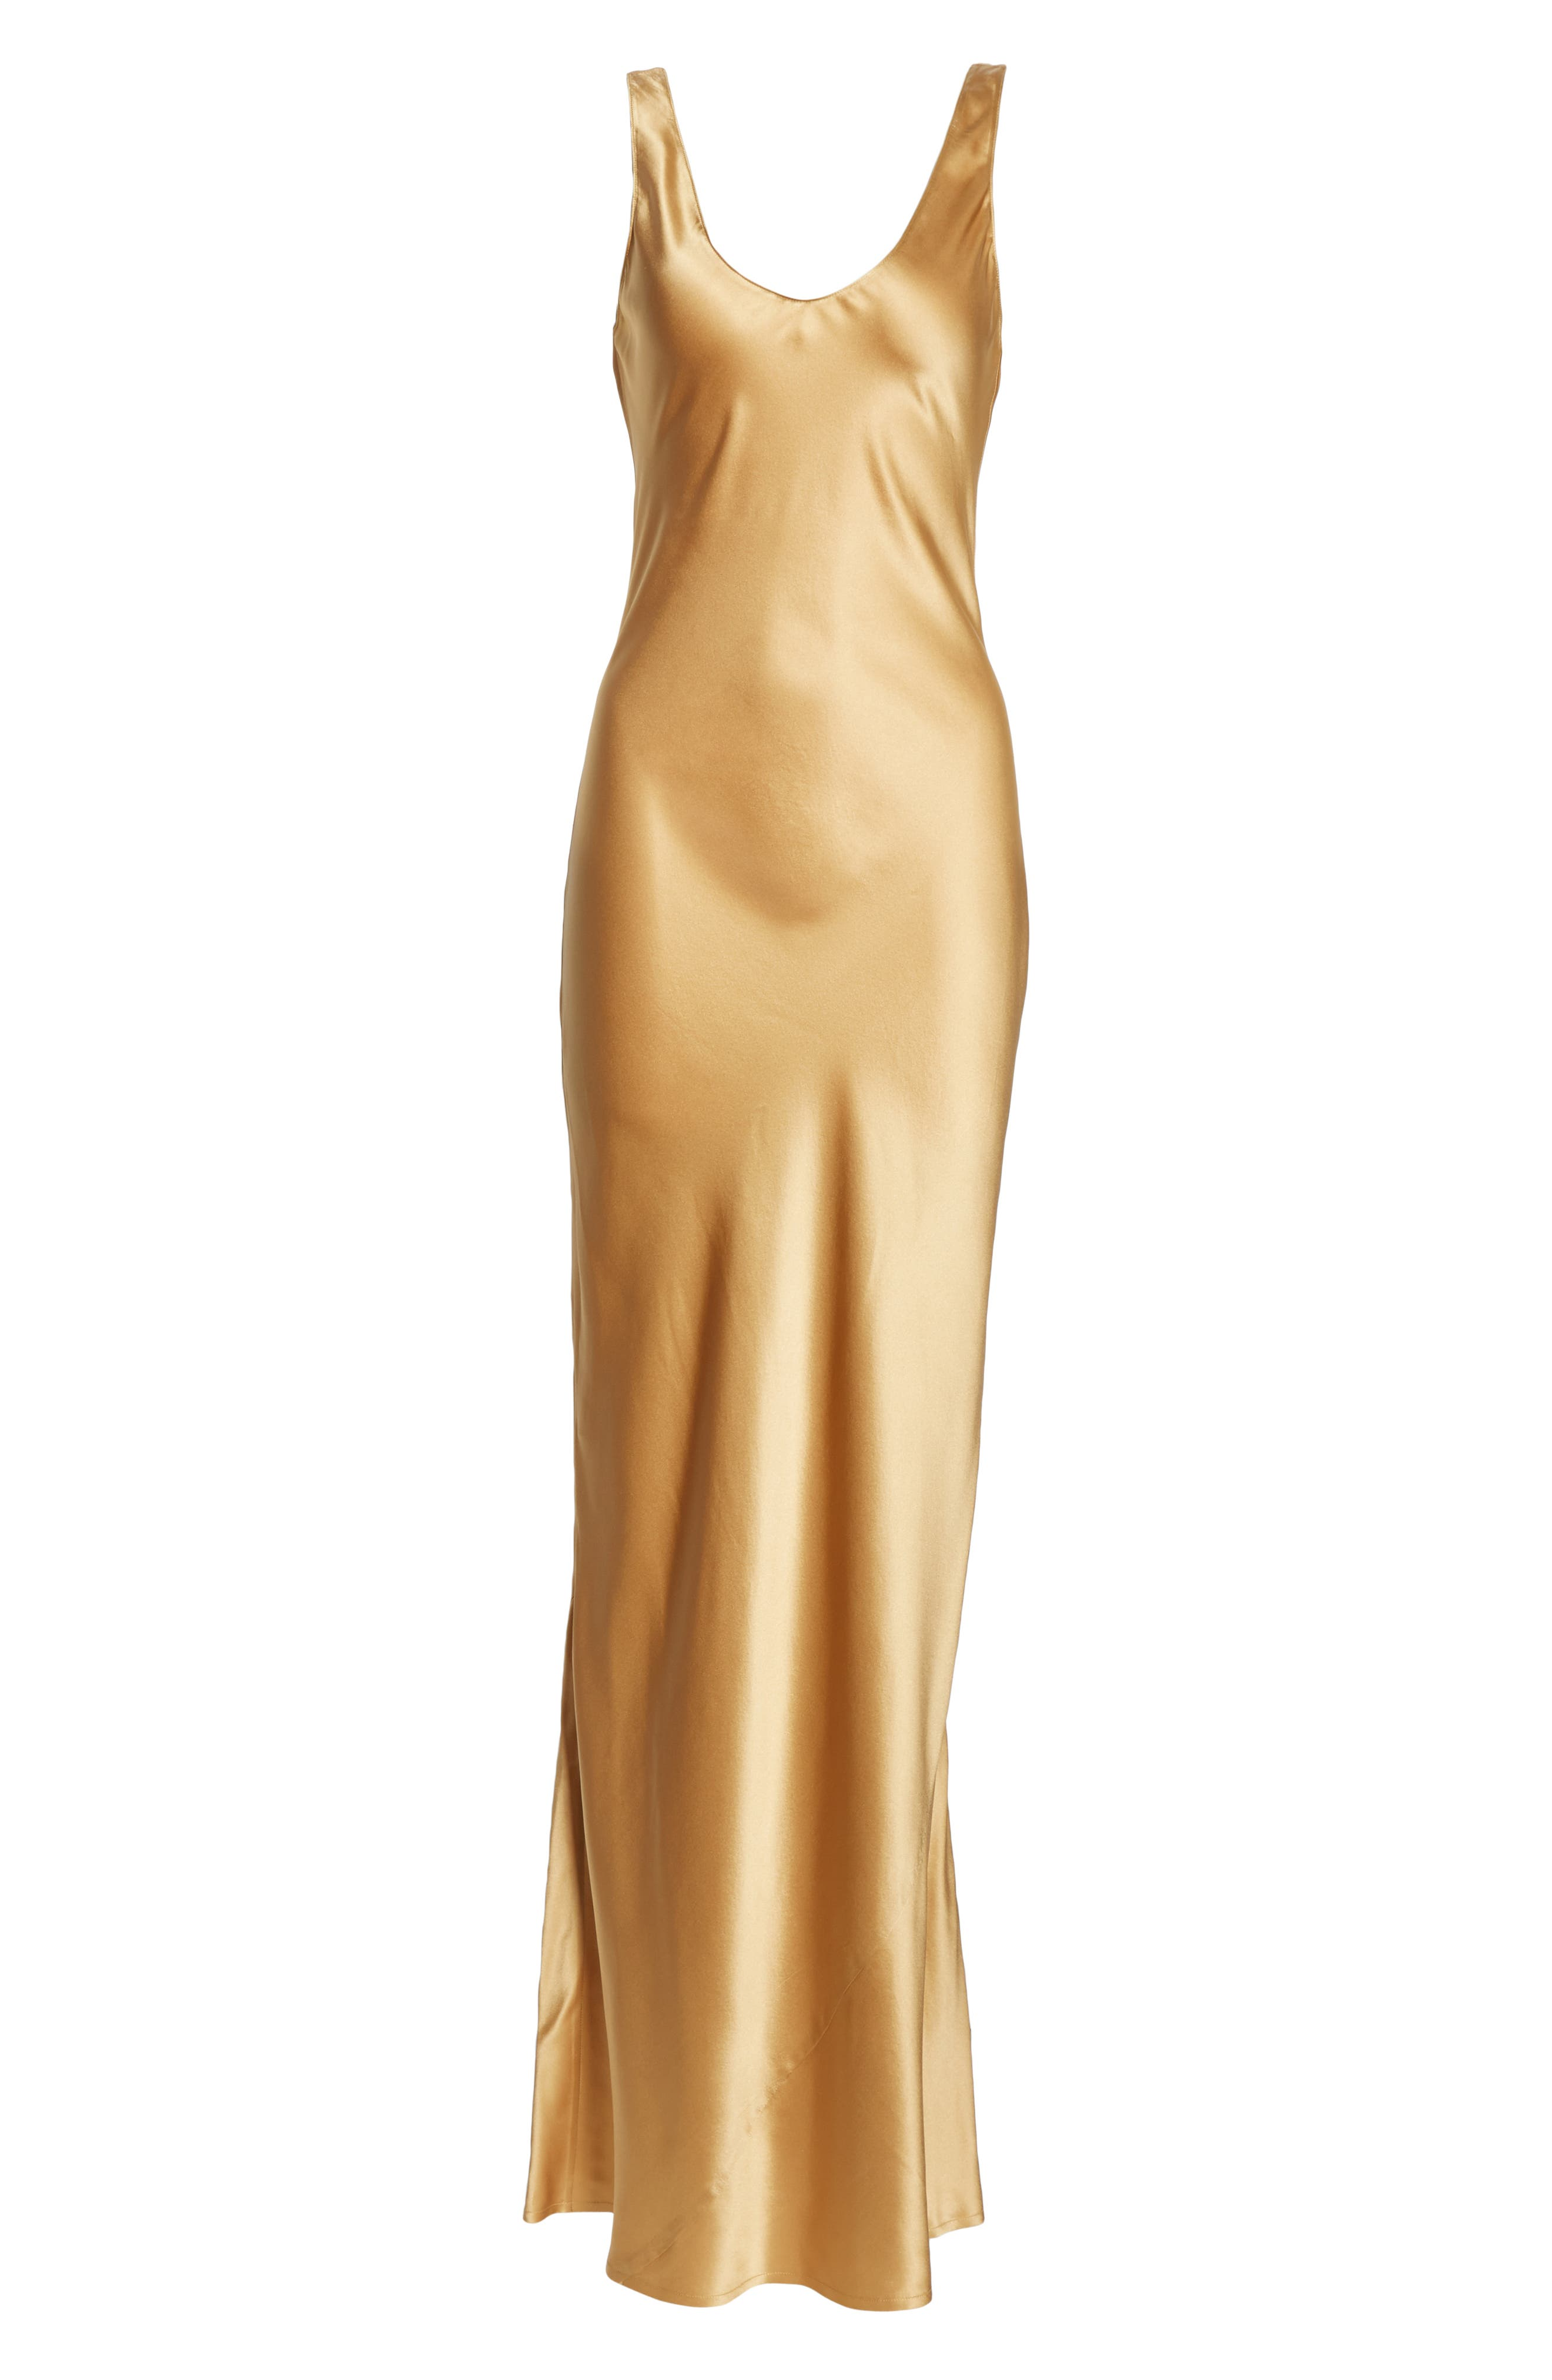 NILI LOTAN, Bazile Silk Evening Dress, Alternate thumbnail 6, color, GOLDEN